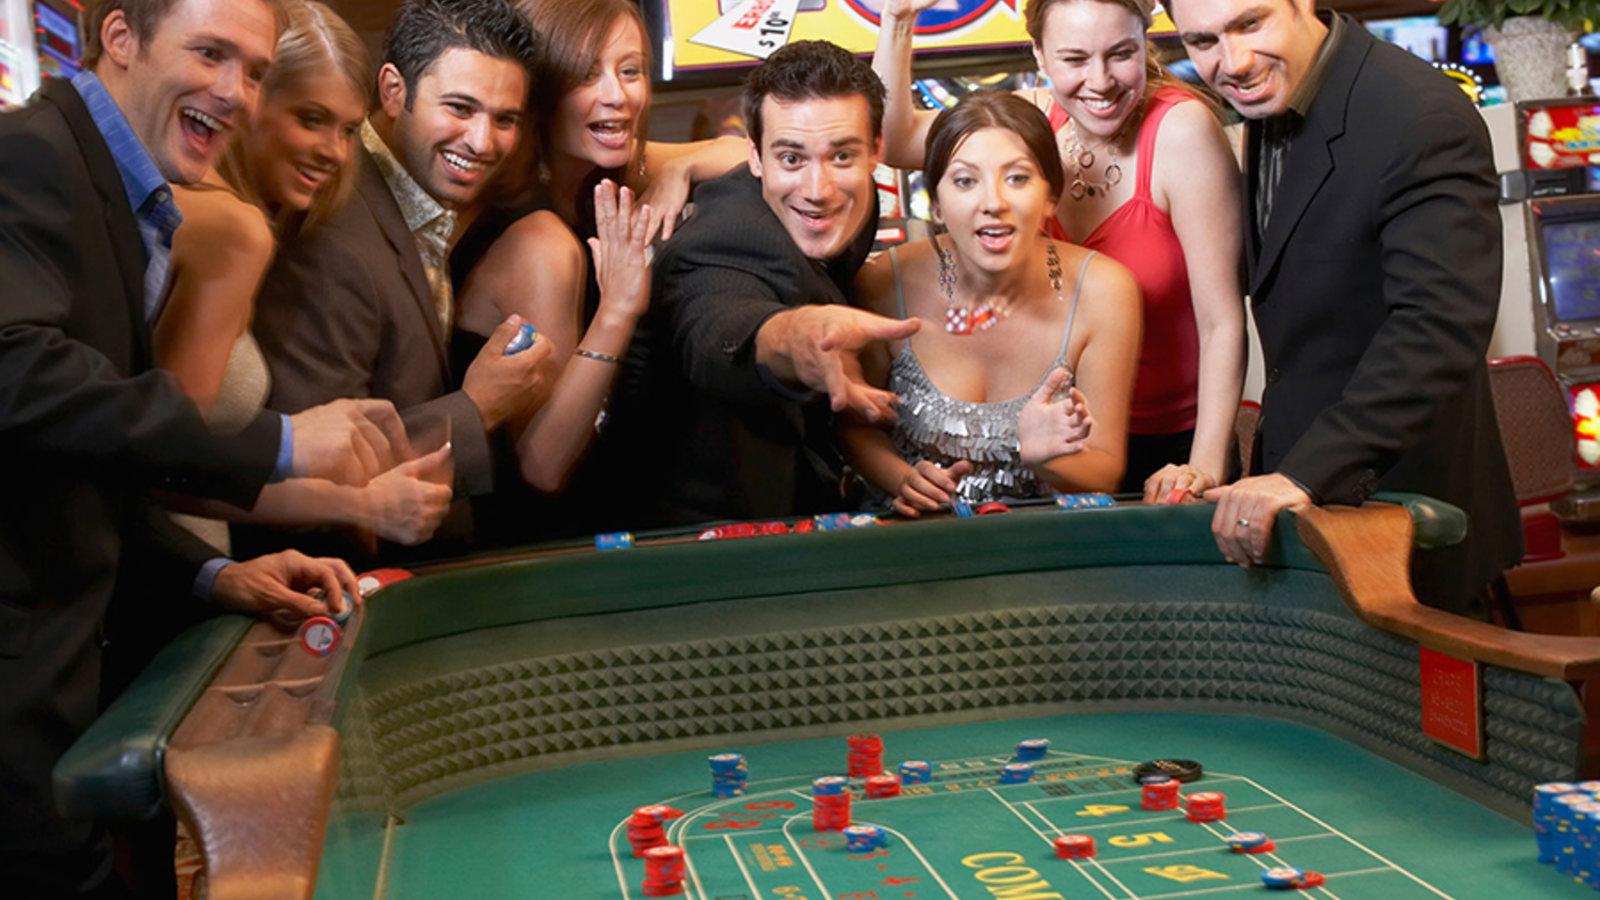 The Gambler's Brain